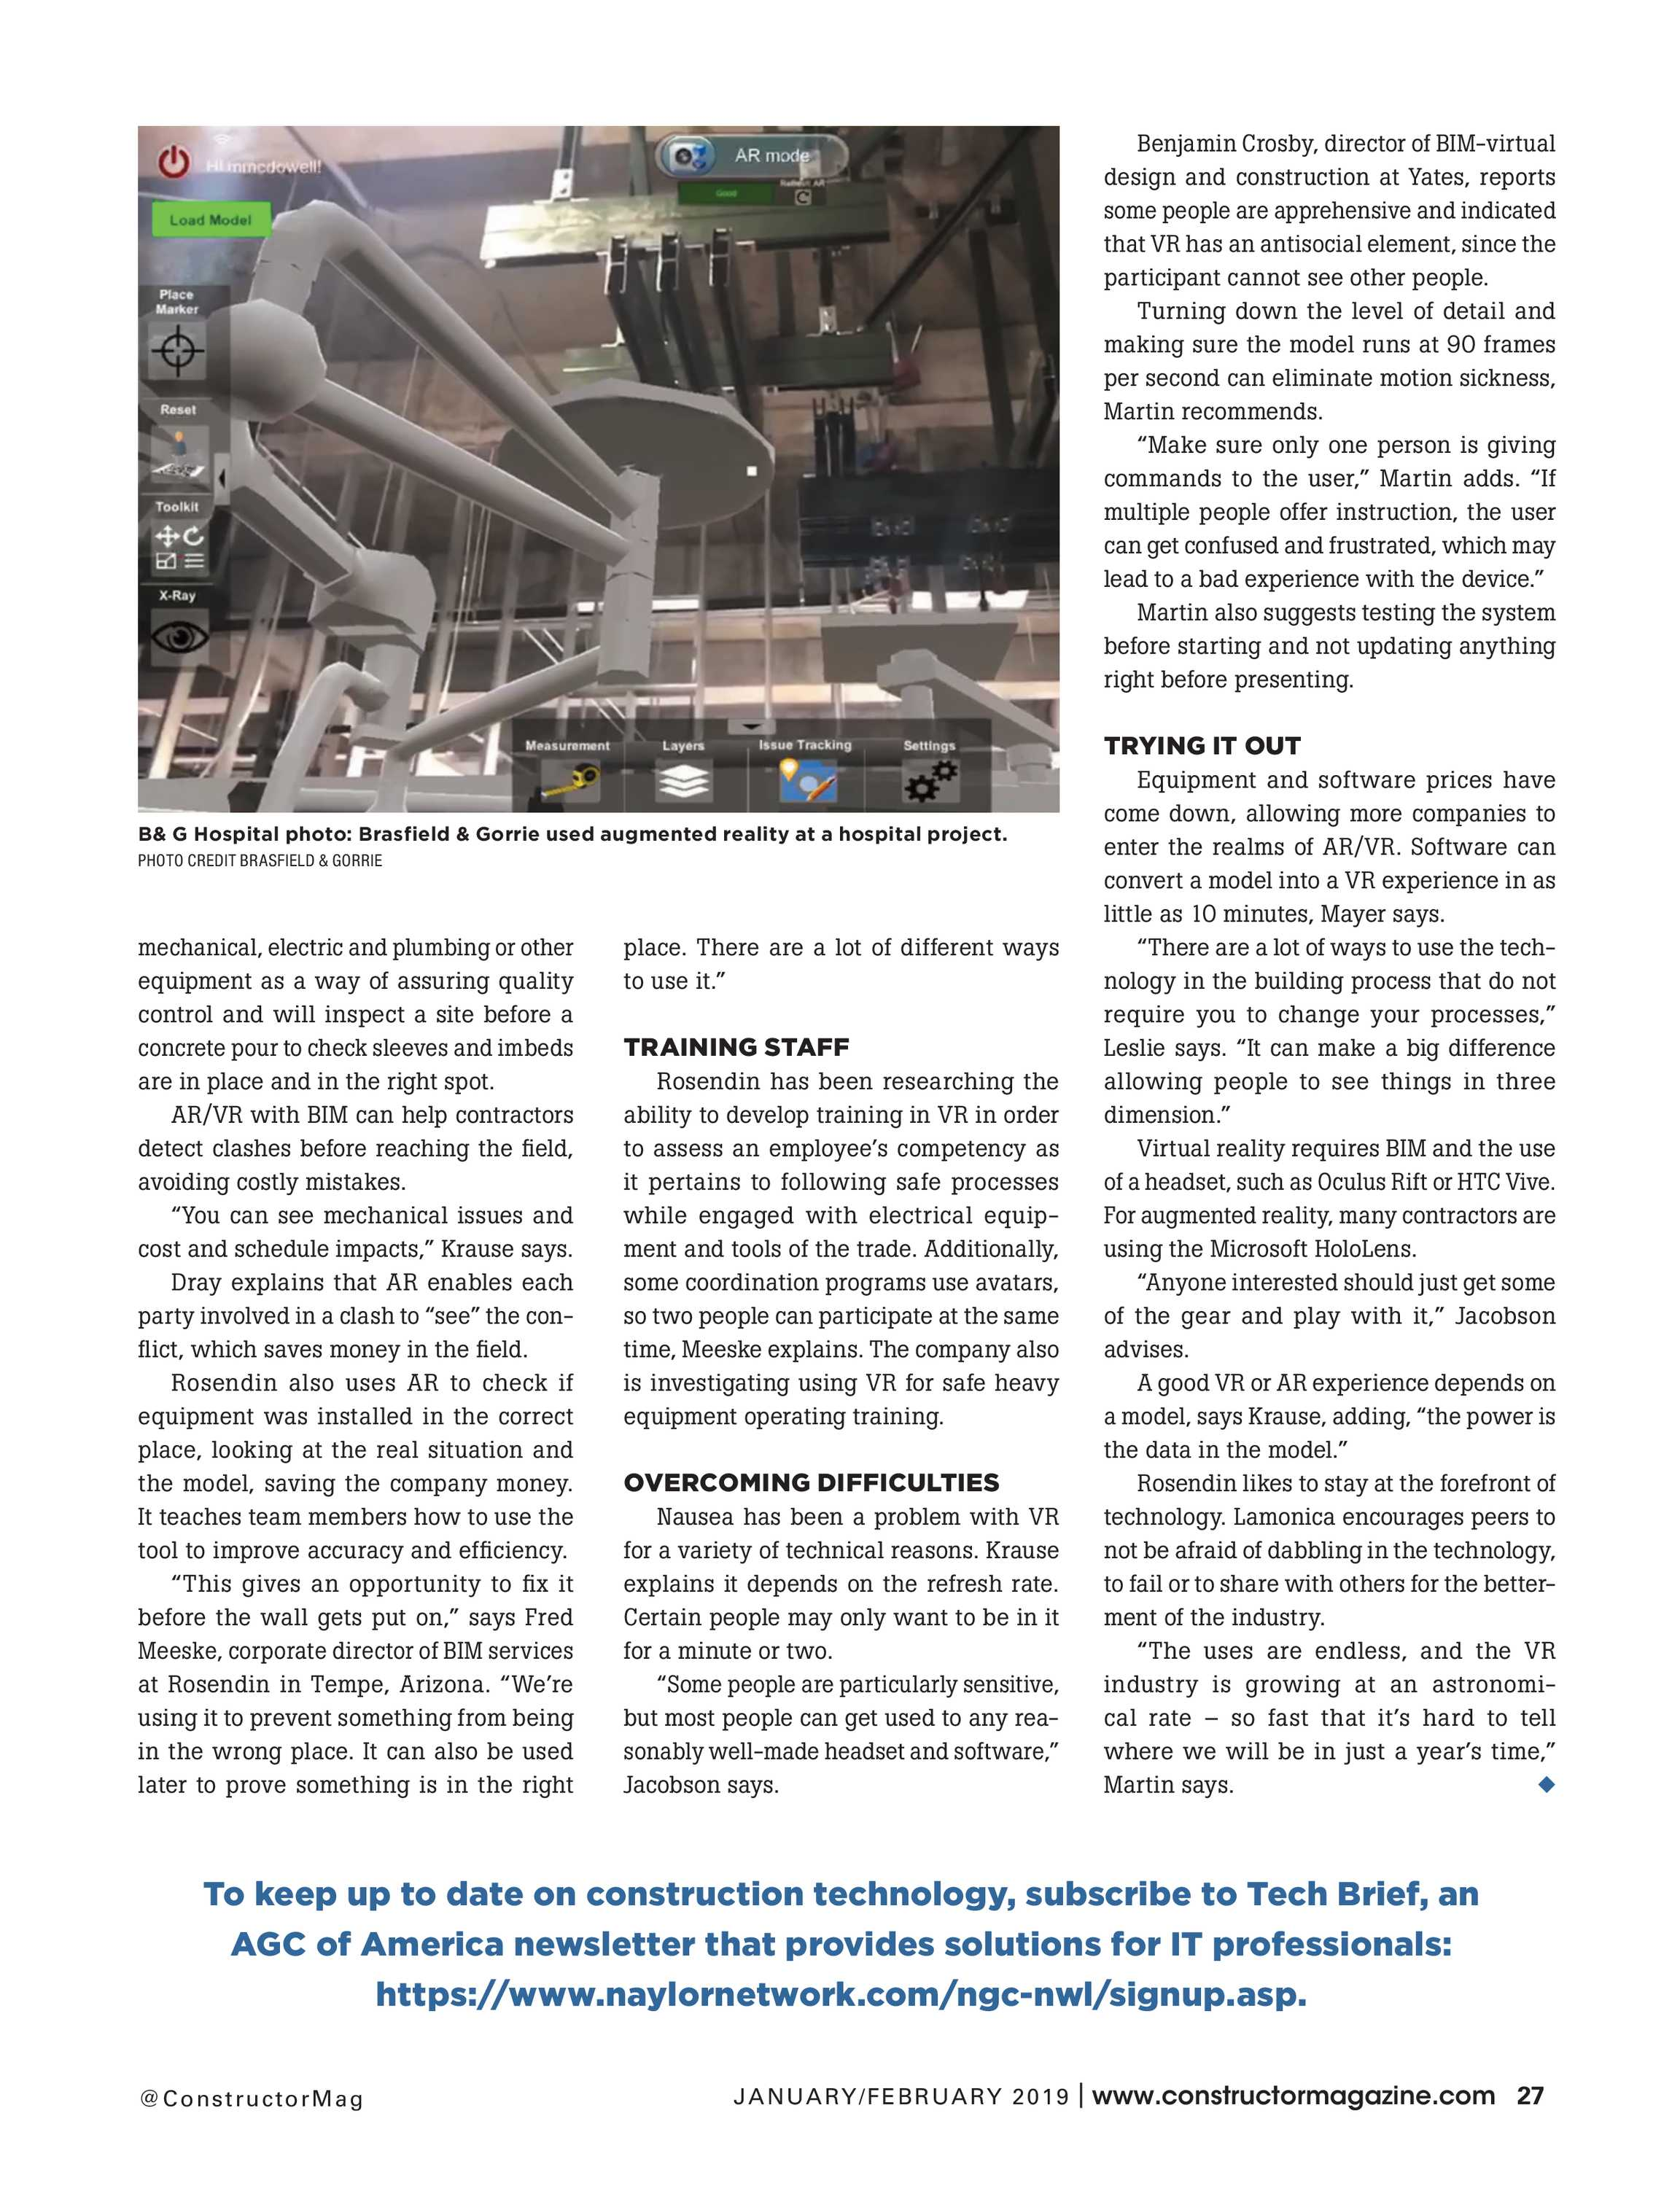 Constructor Magazine (NGCS) - January/February 2019 - page 29